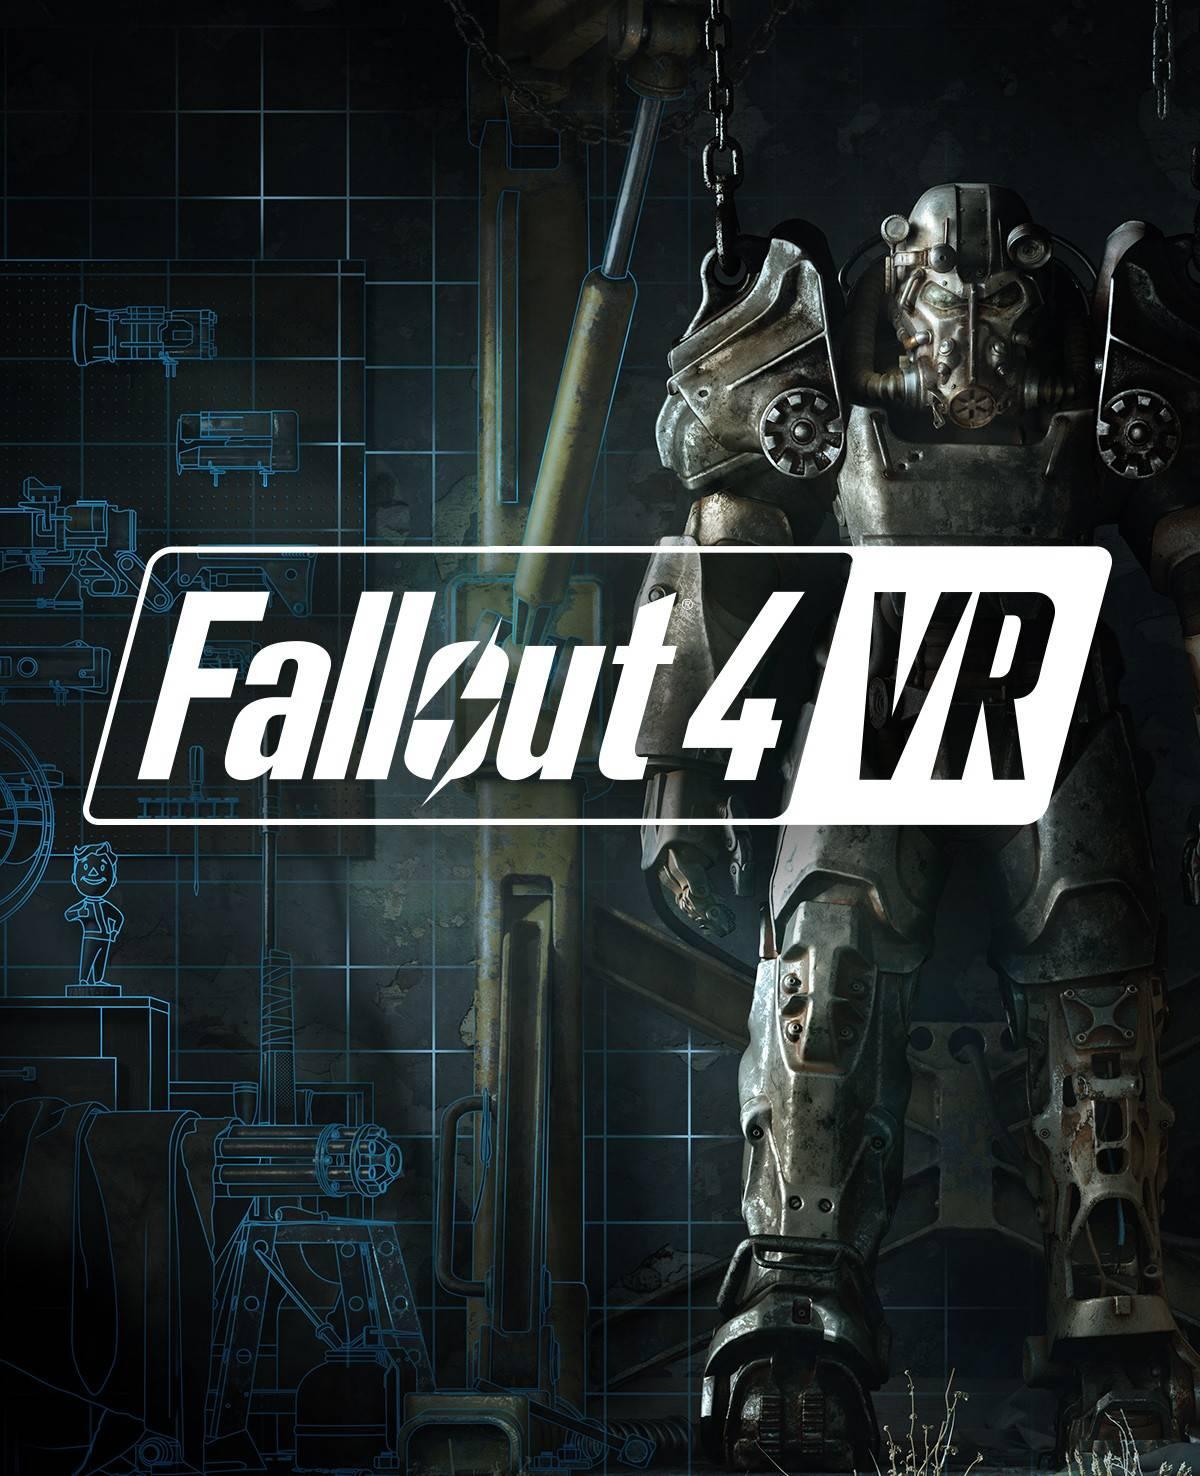 bethesda game studios Fallout 4 VR